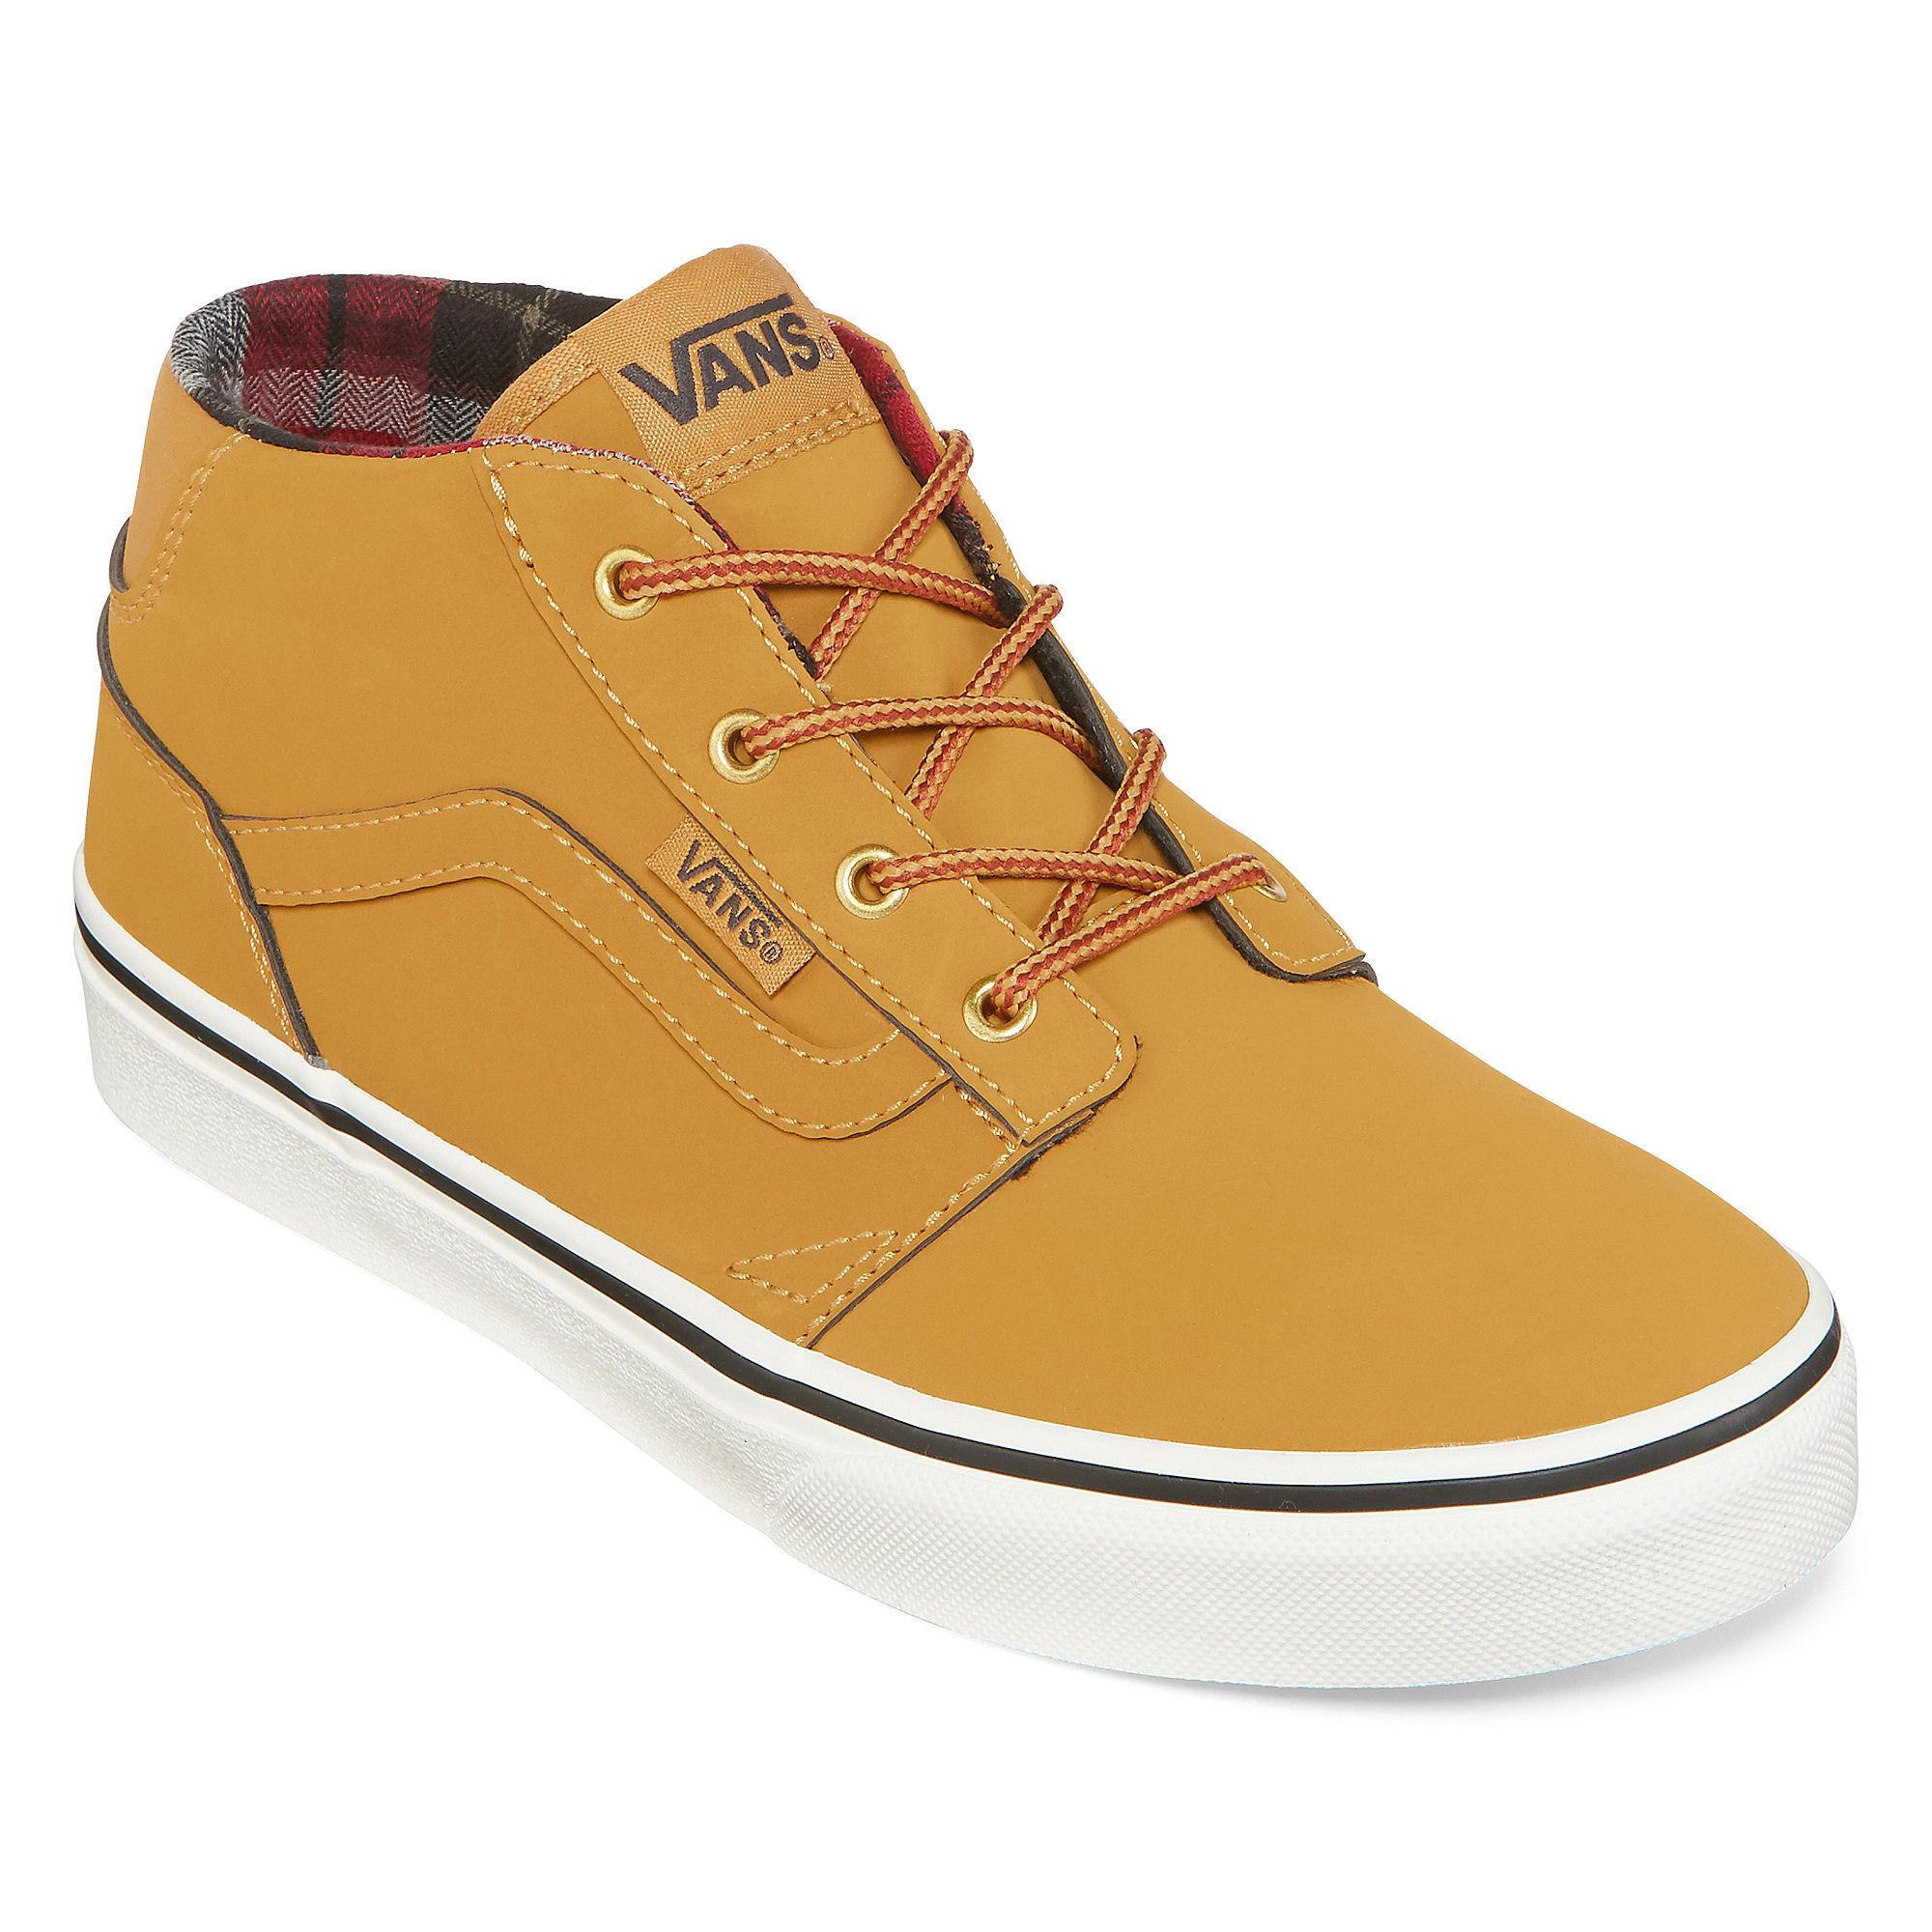 vans chapman boys' skate shoes